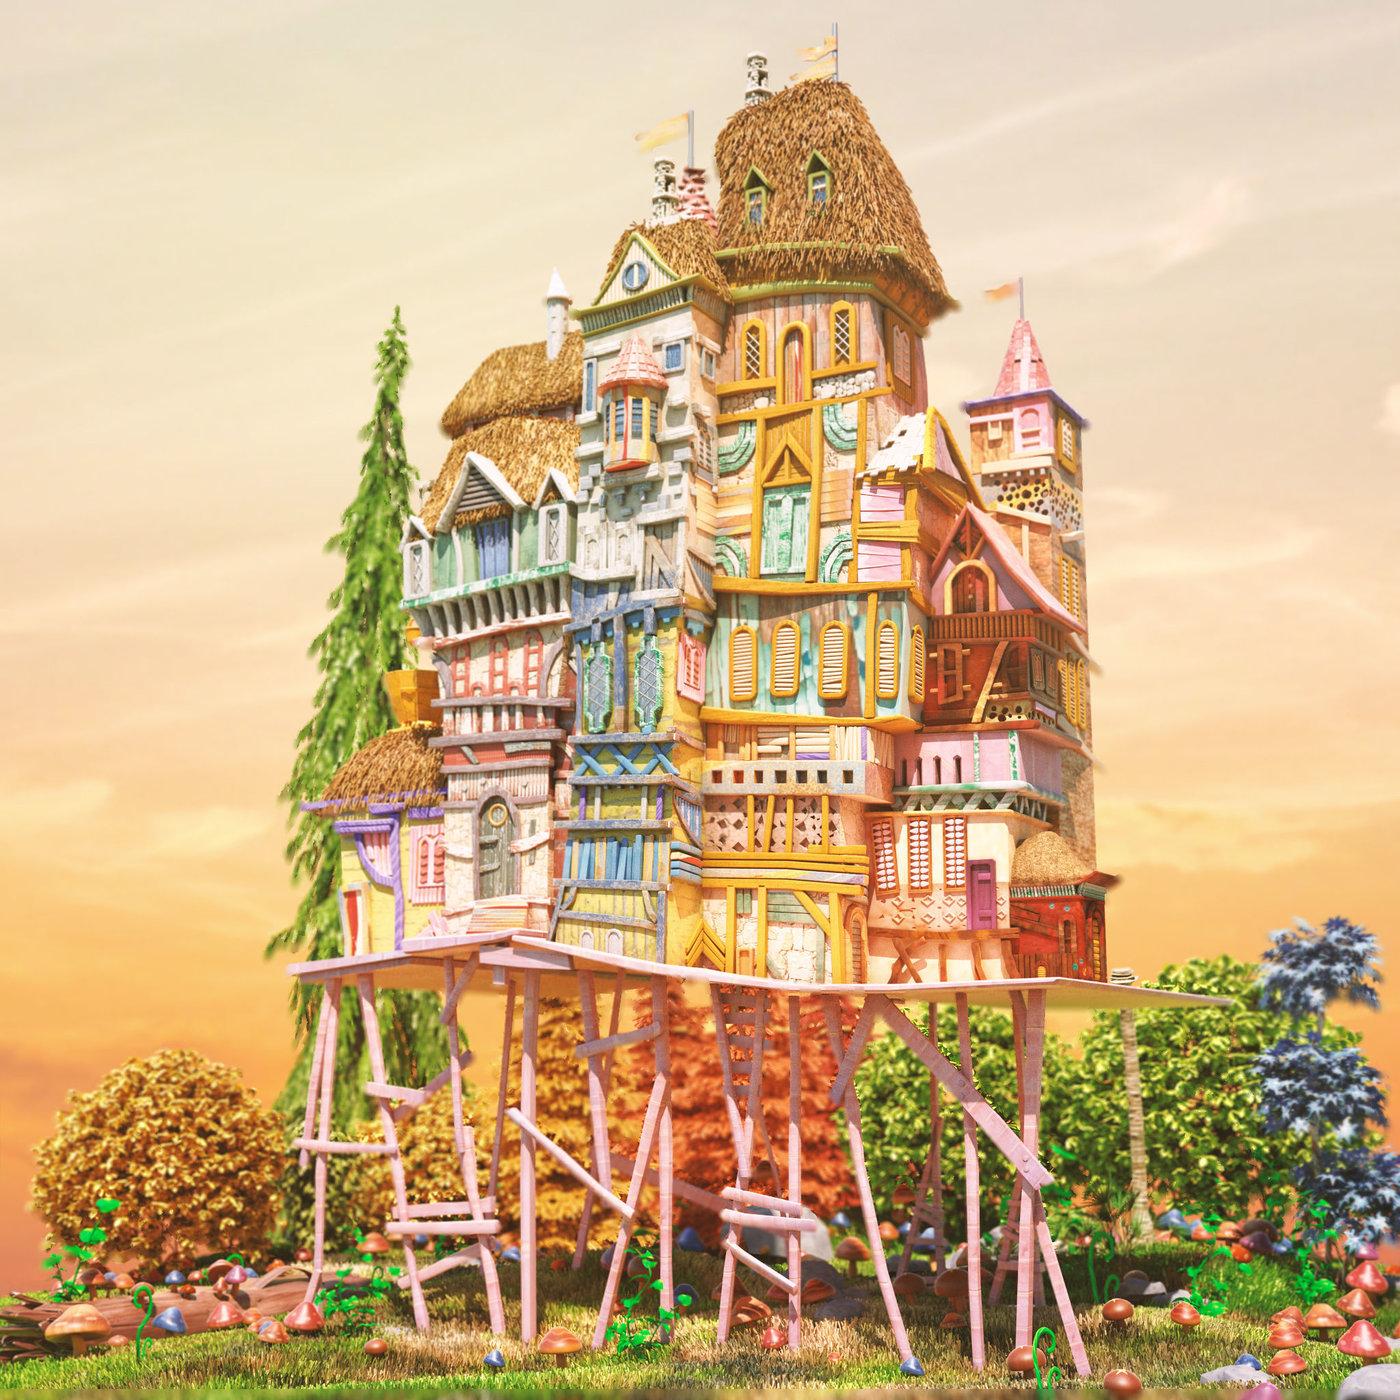 Princess kira Castle